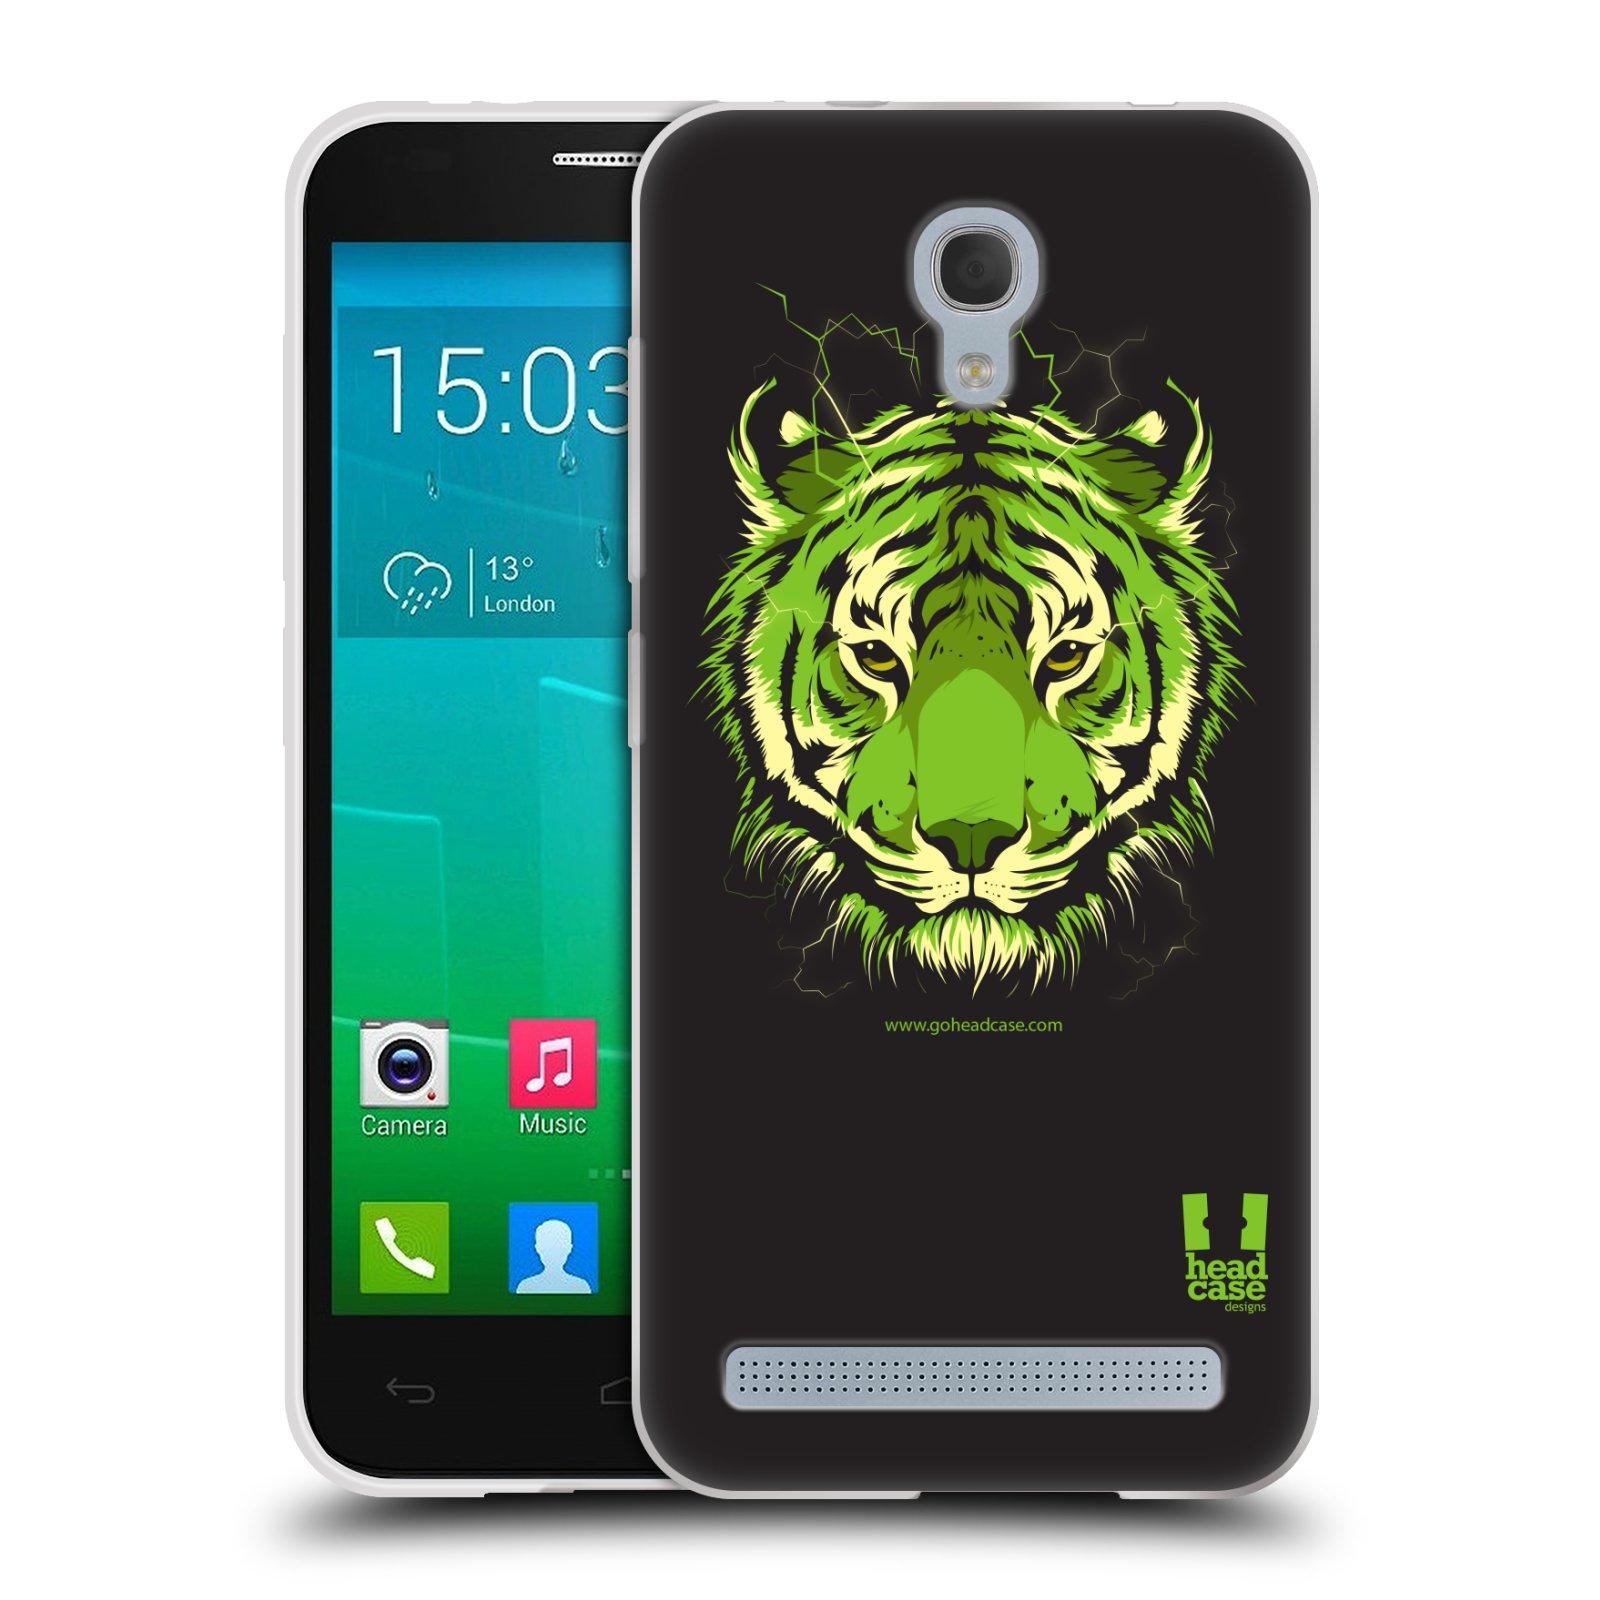 Silikonové pouzdro na mobil Alcatel One Touch Idol 2 Mini S 6036Y HEAD CASE BENGÁLSKÝ TYGR (Silikonový kryt či obal na mobilní telefon Alcatel Idol 2 Mini S OT-6036Y)